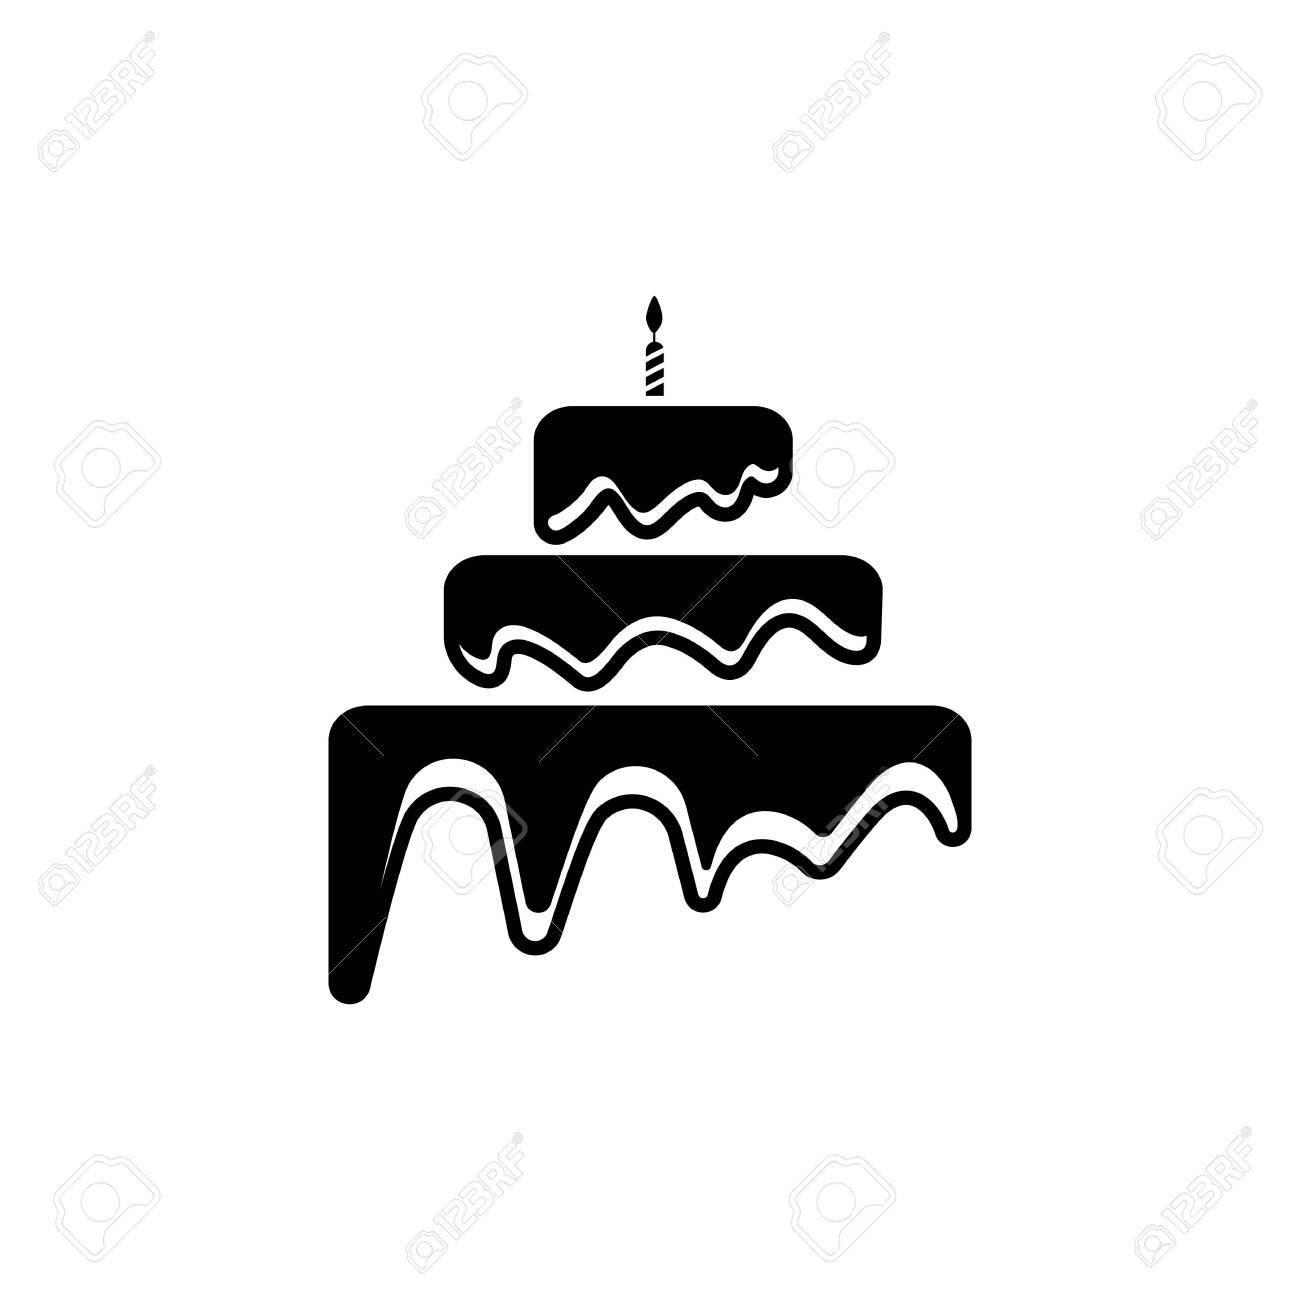 Cake sign icon vector illustration design template - 129462303